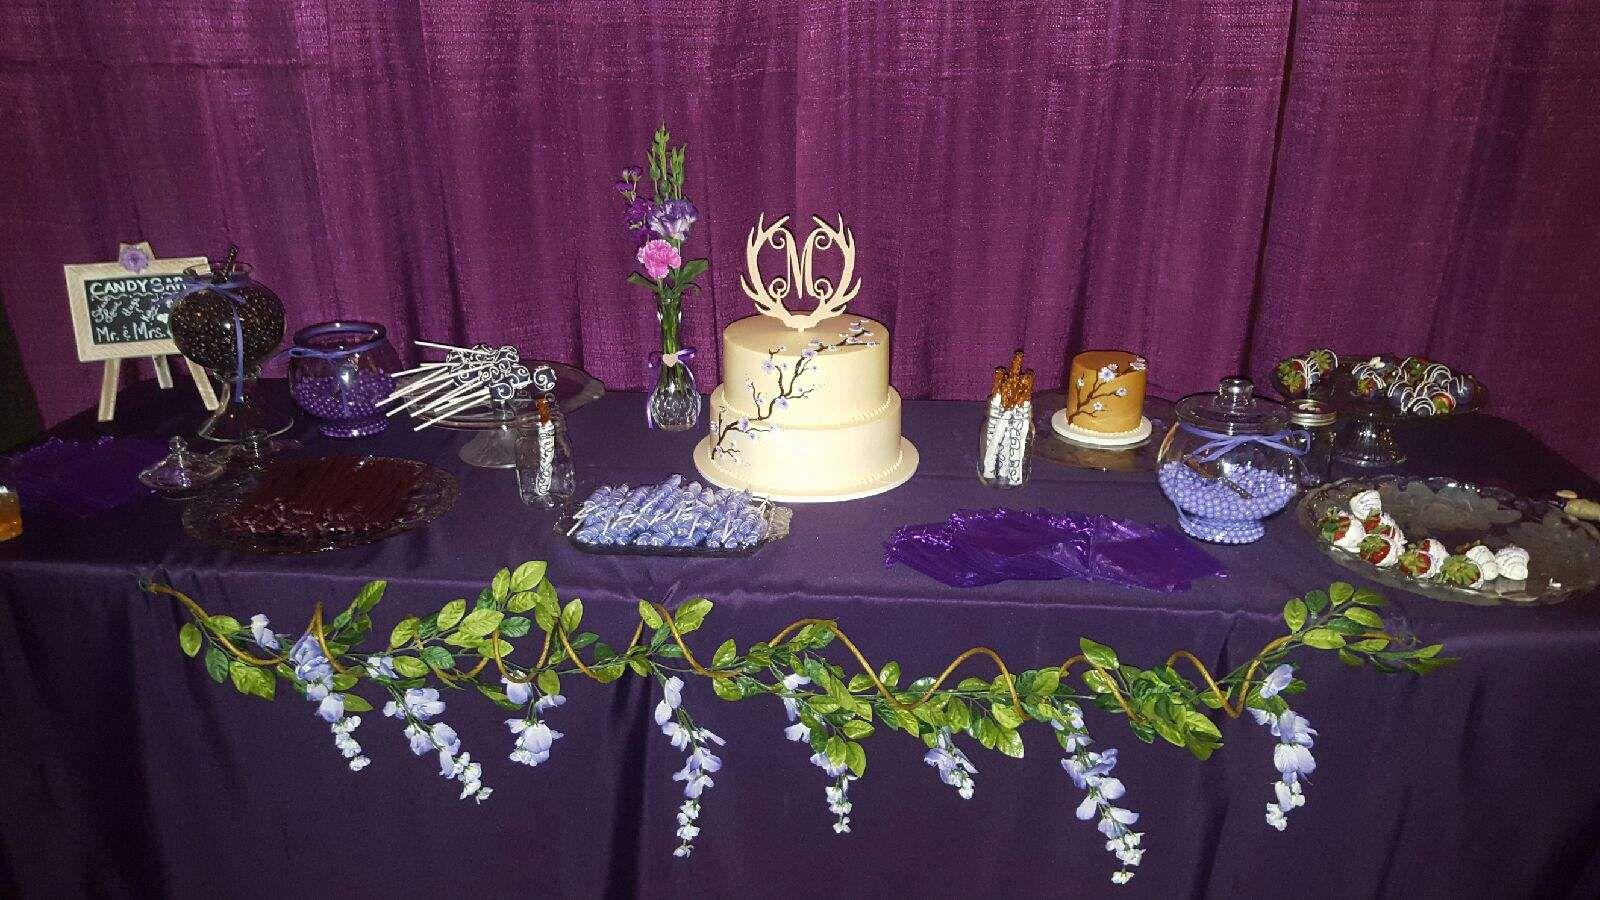 Cakecandygoodie table my sweet baby girl laurenus wedding